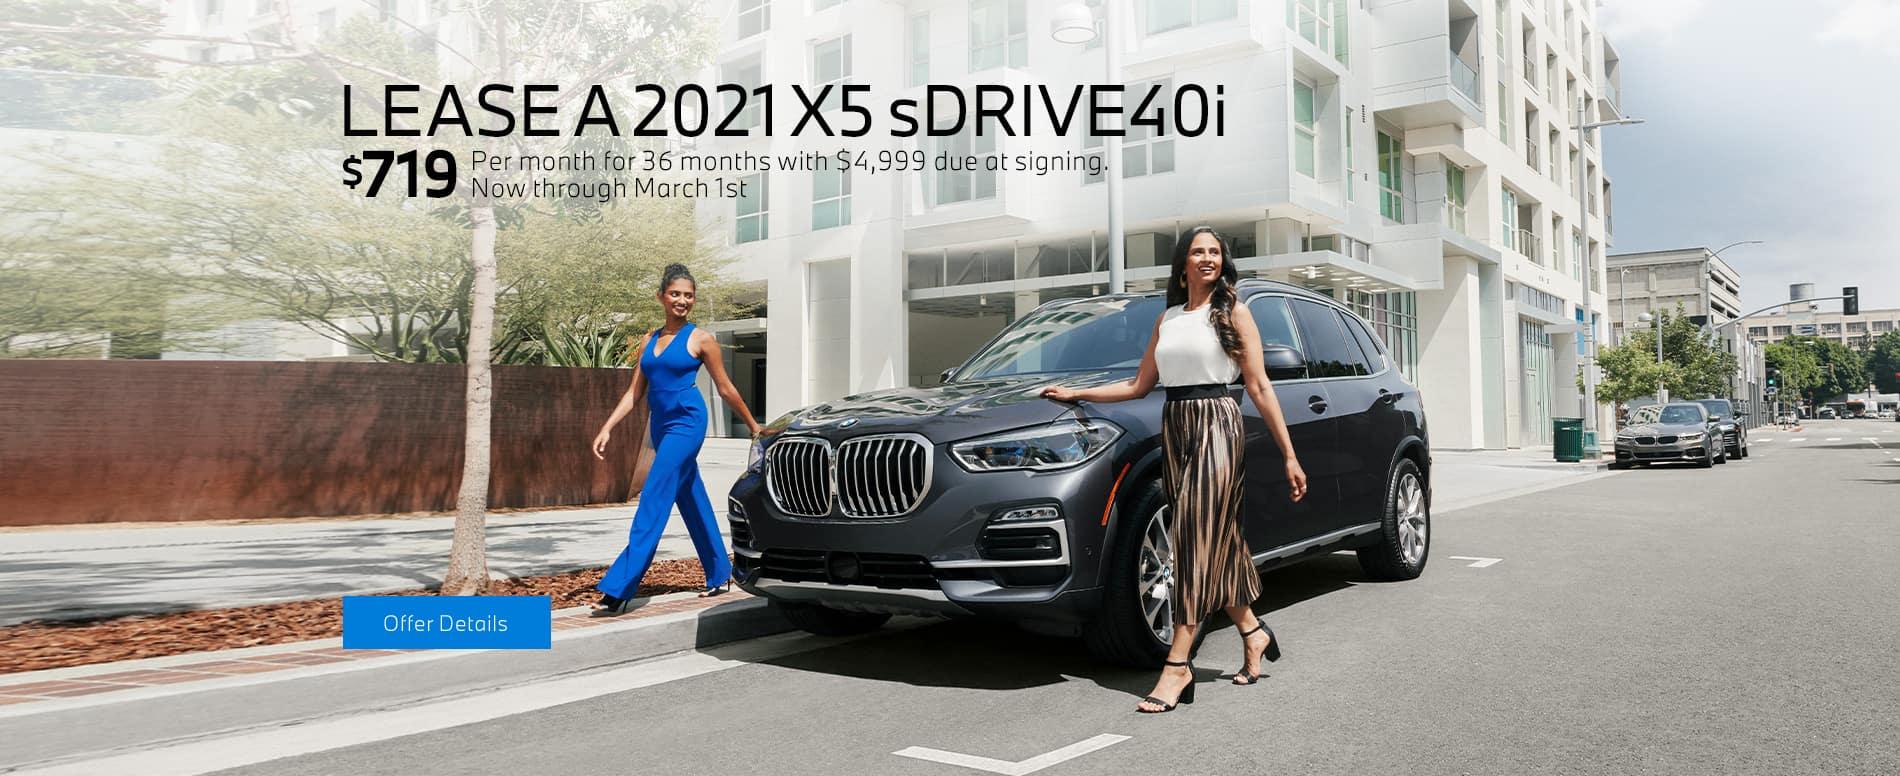 LEASE A 2021 X5 SDRIVE40I